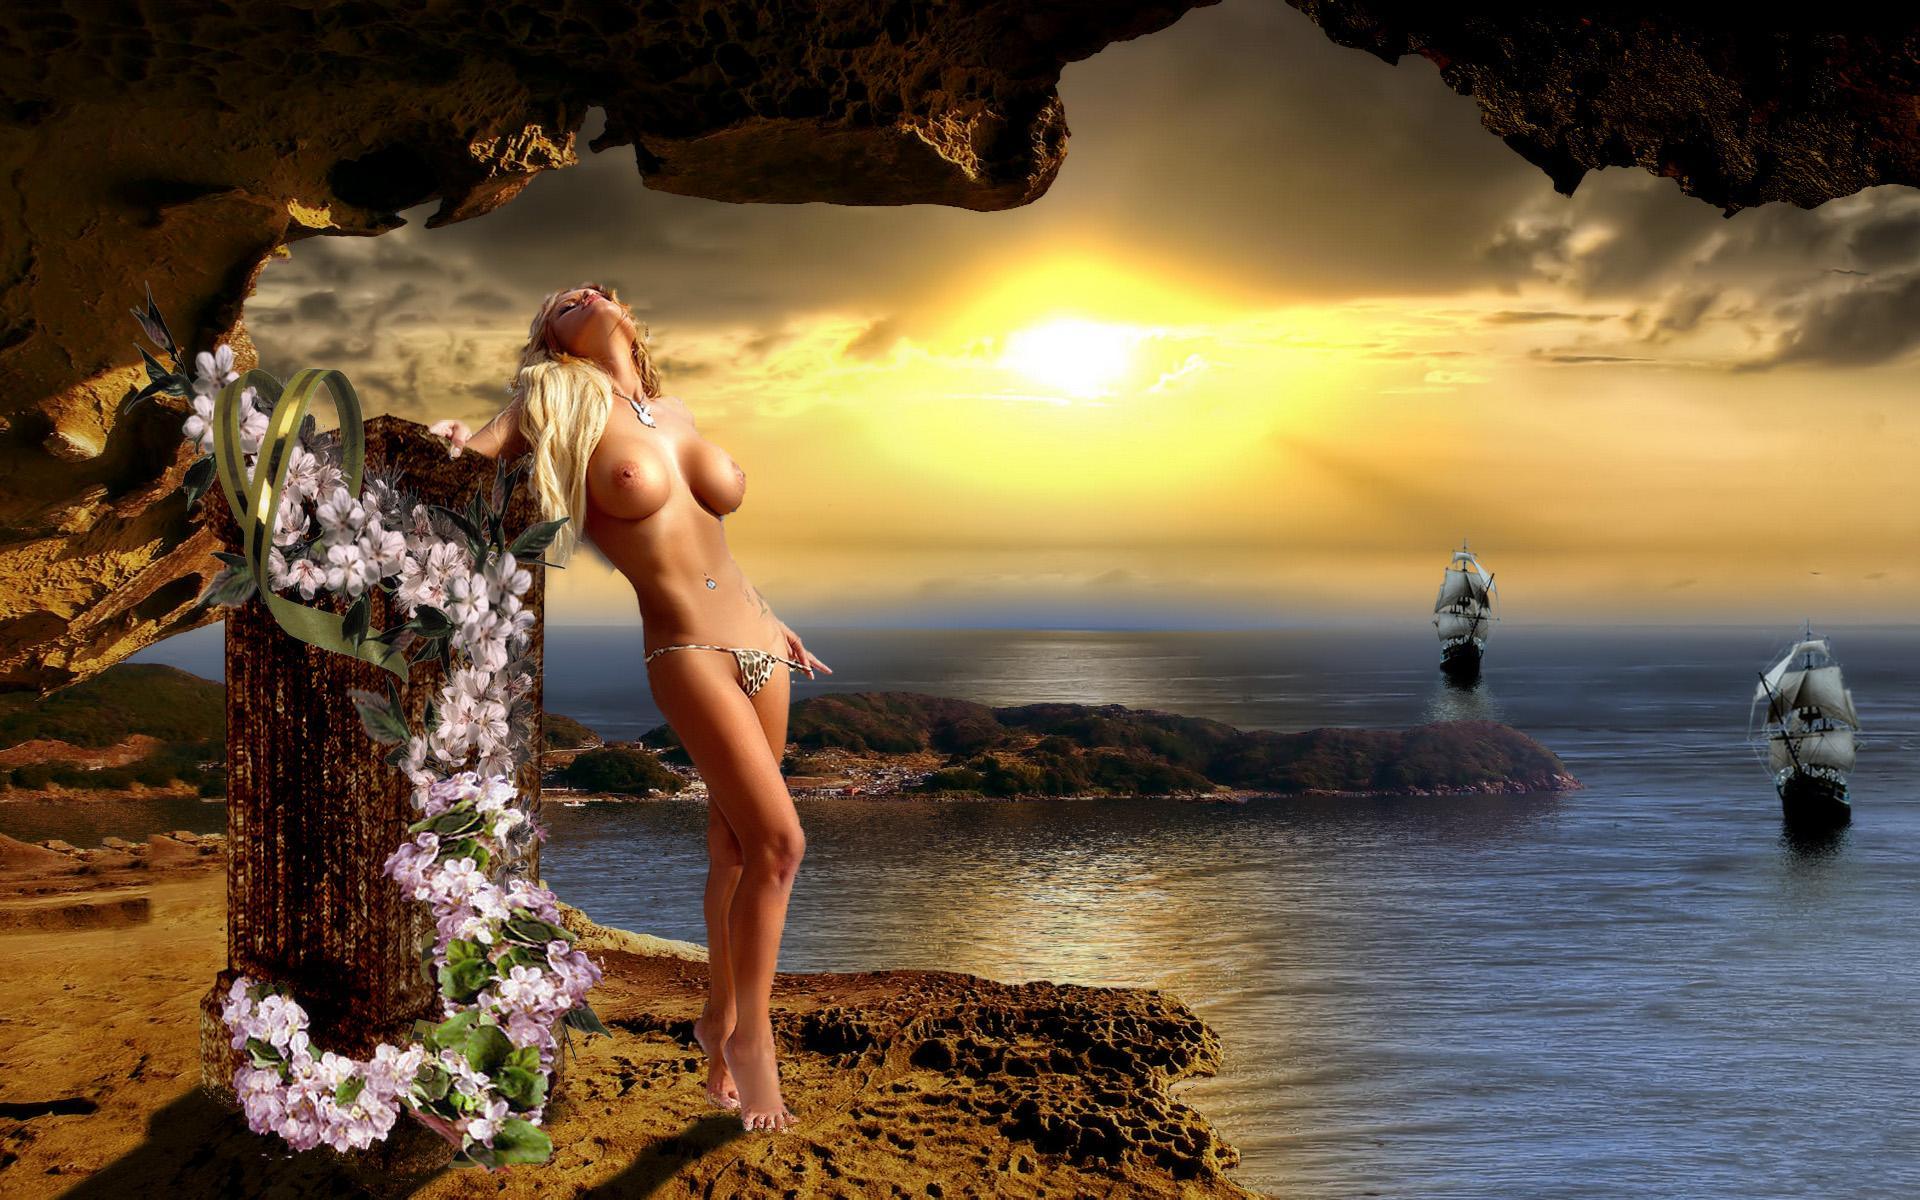 Nude art fantasy pirate xxx videos